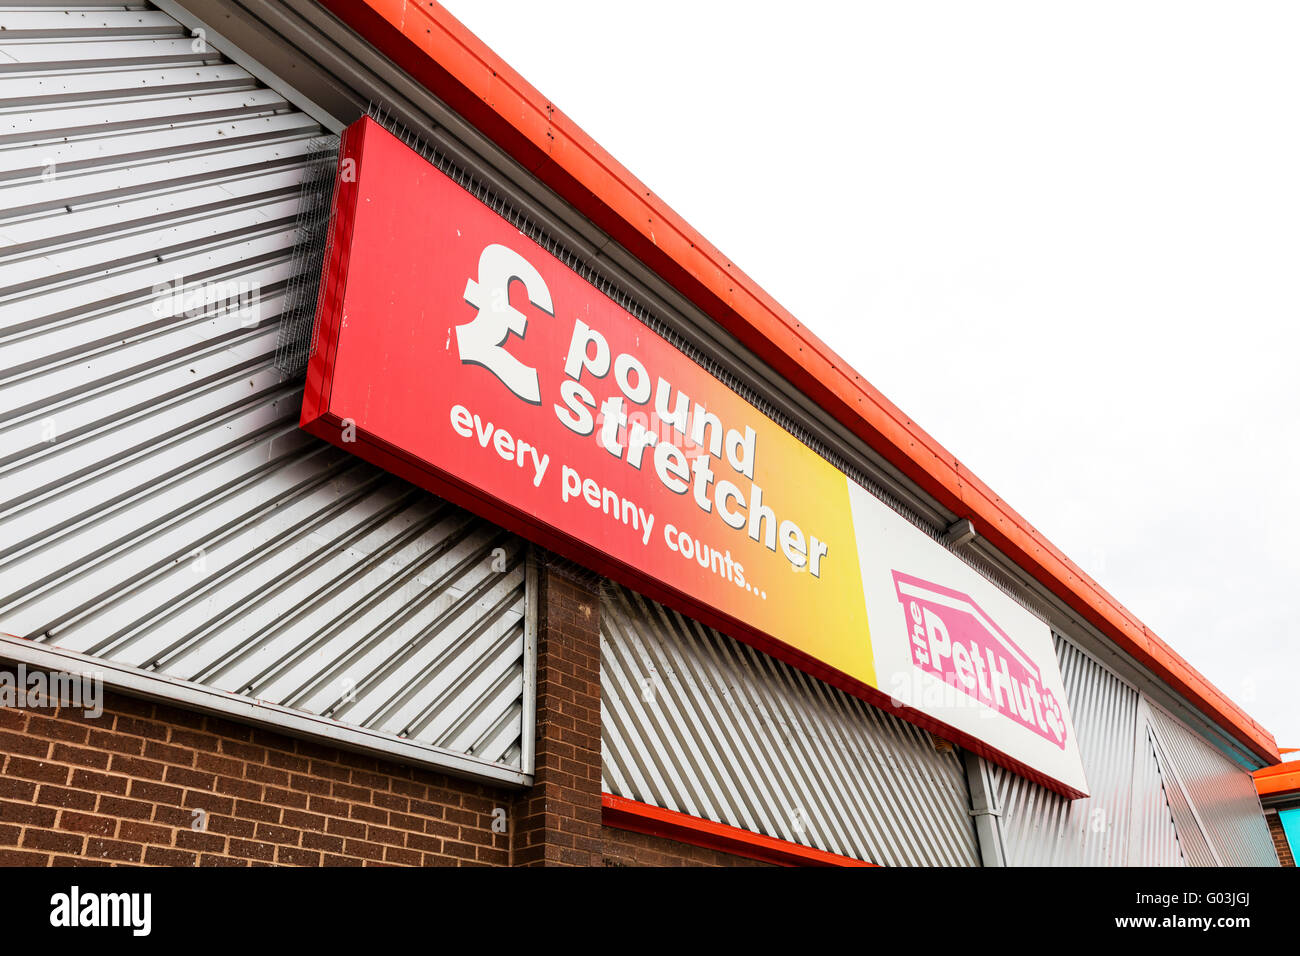 Pound stretcher discount shop retailer shopping sign name store exterior logo UK England retail shops stores company - Stock Image